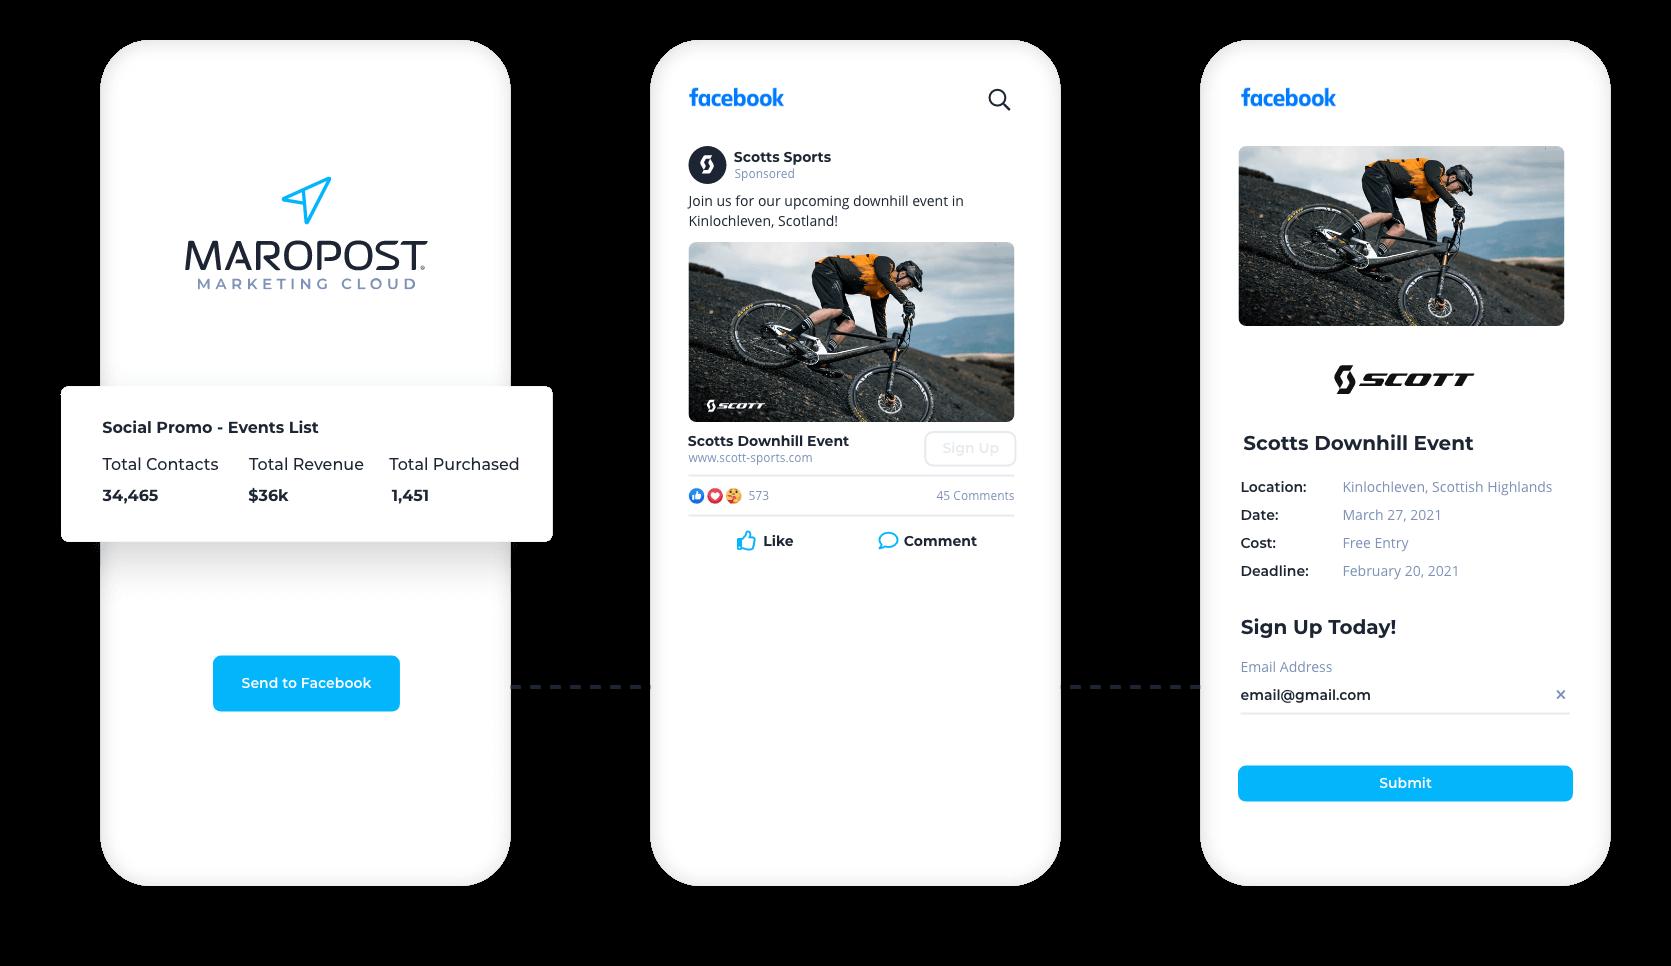 Maropost Marketing Cloud Social